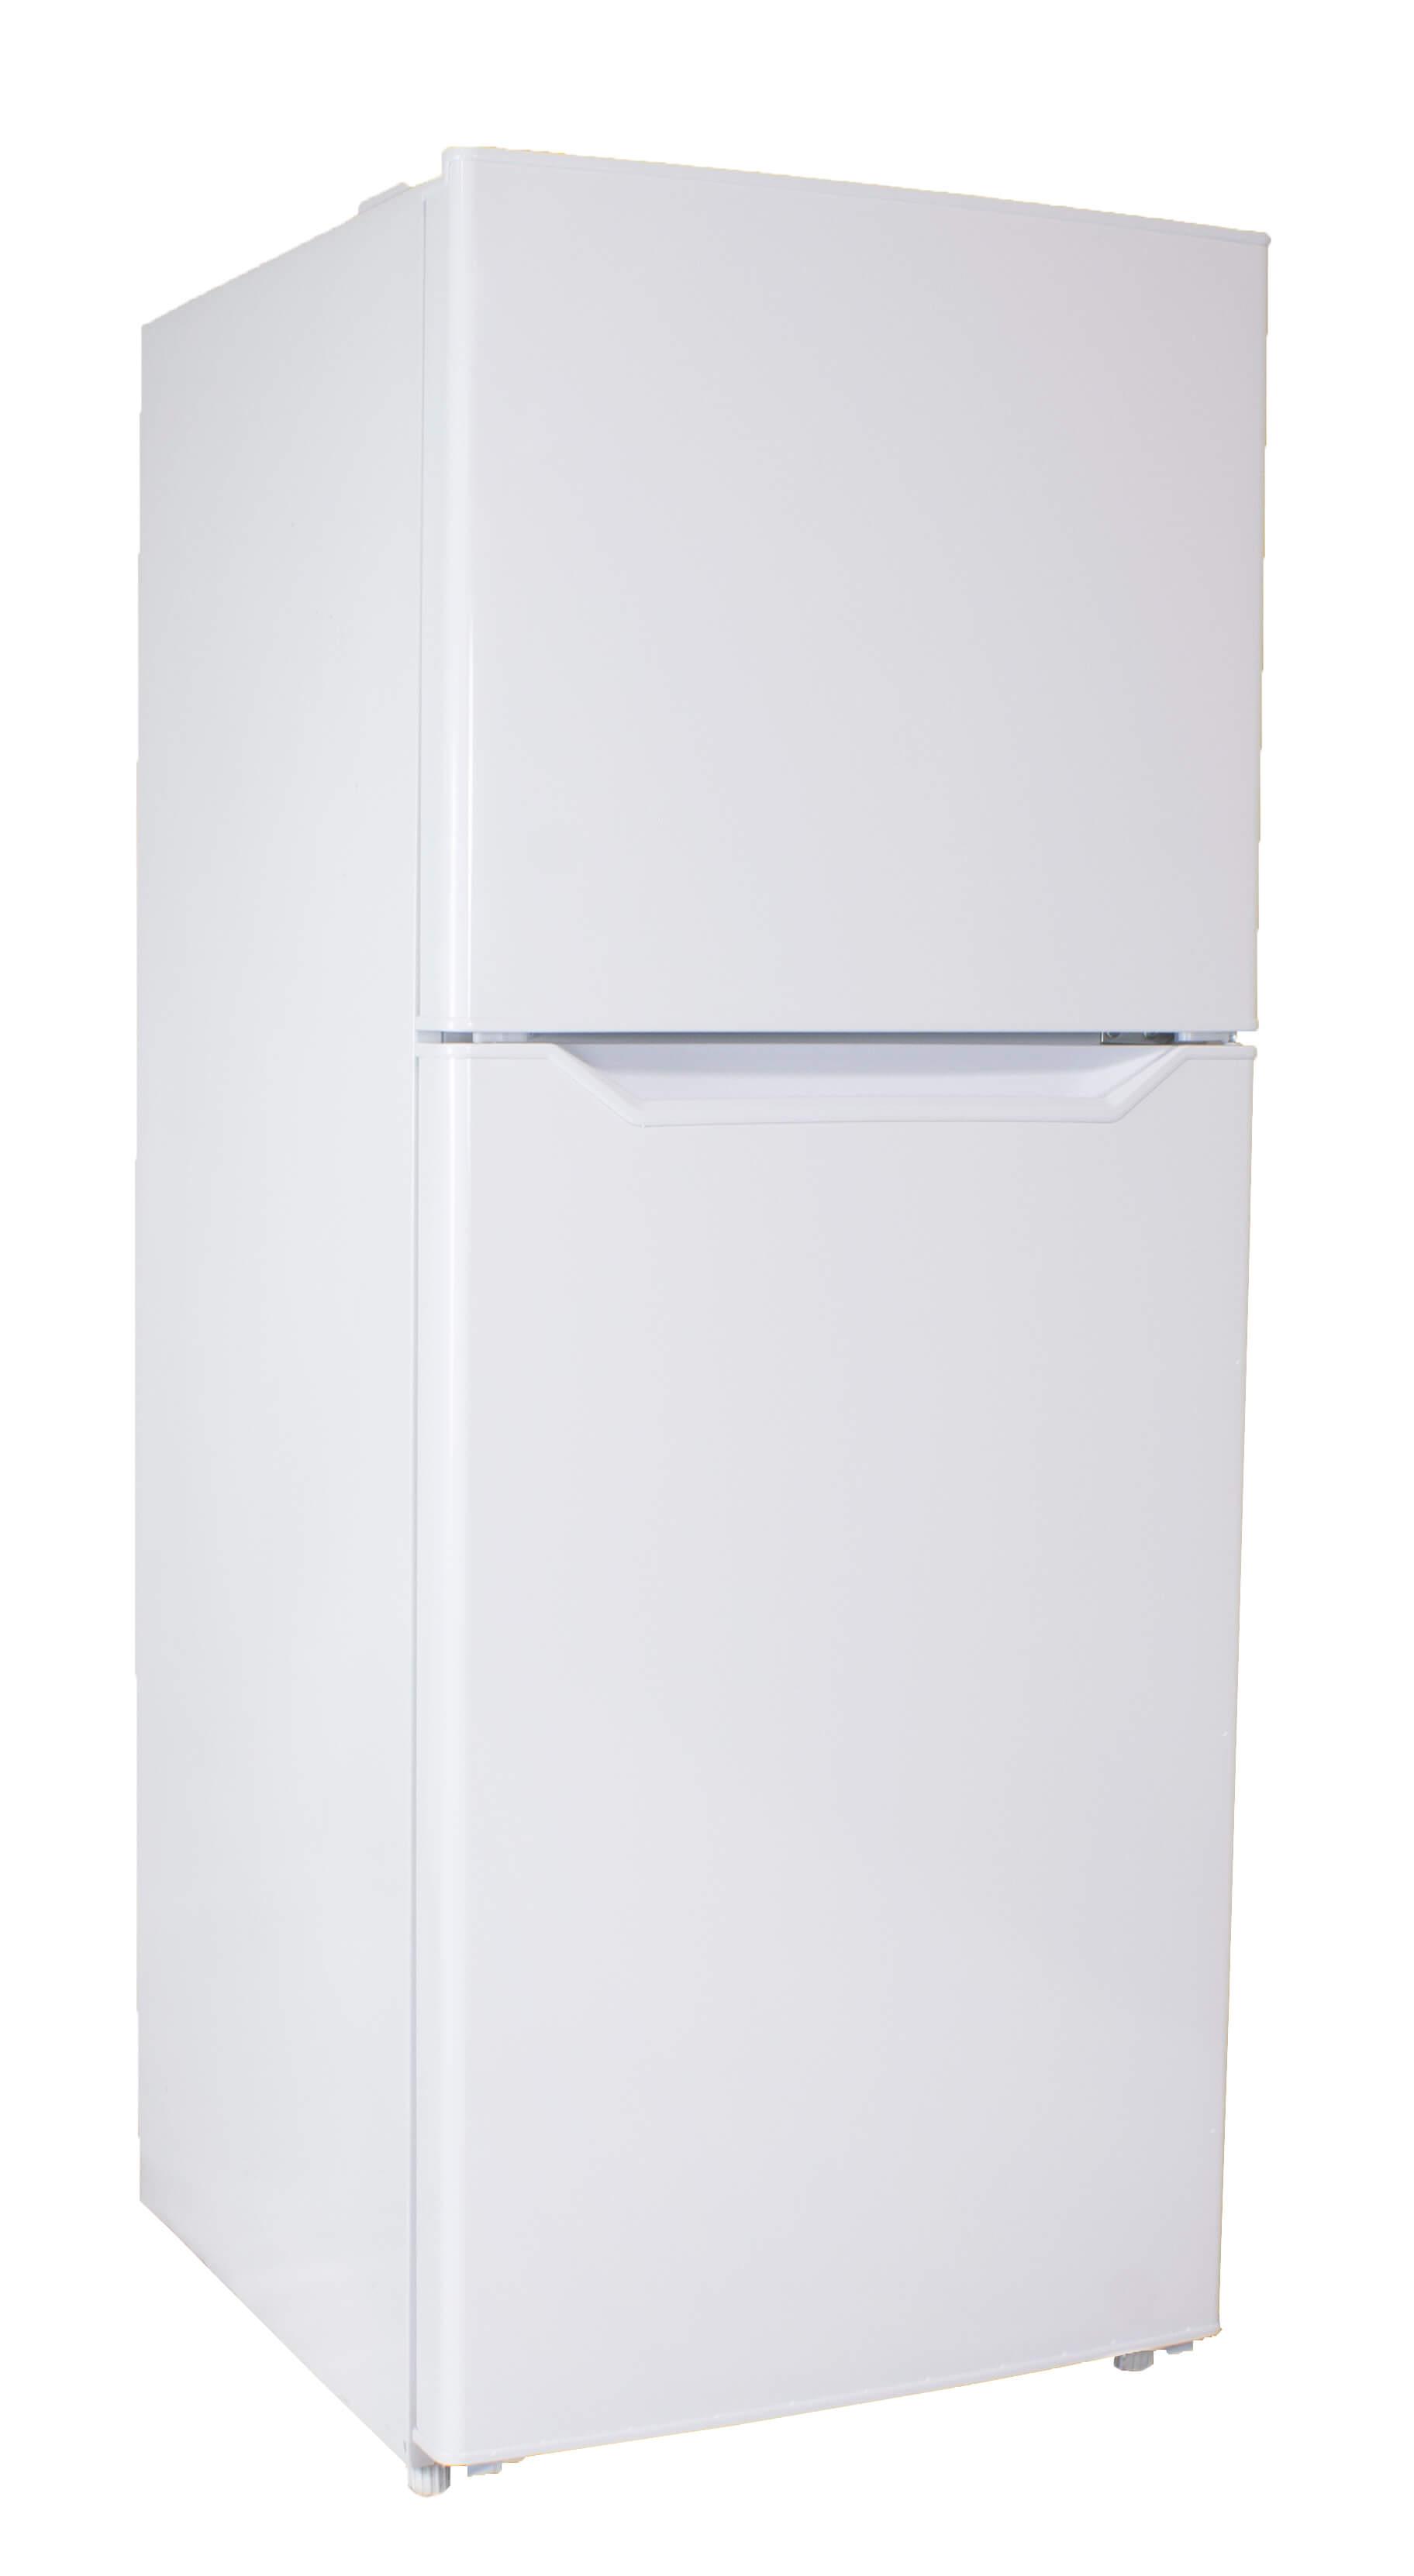 23410 – 10 cubic foot fridge